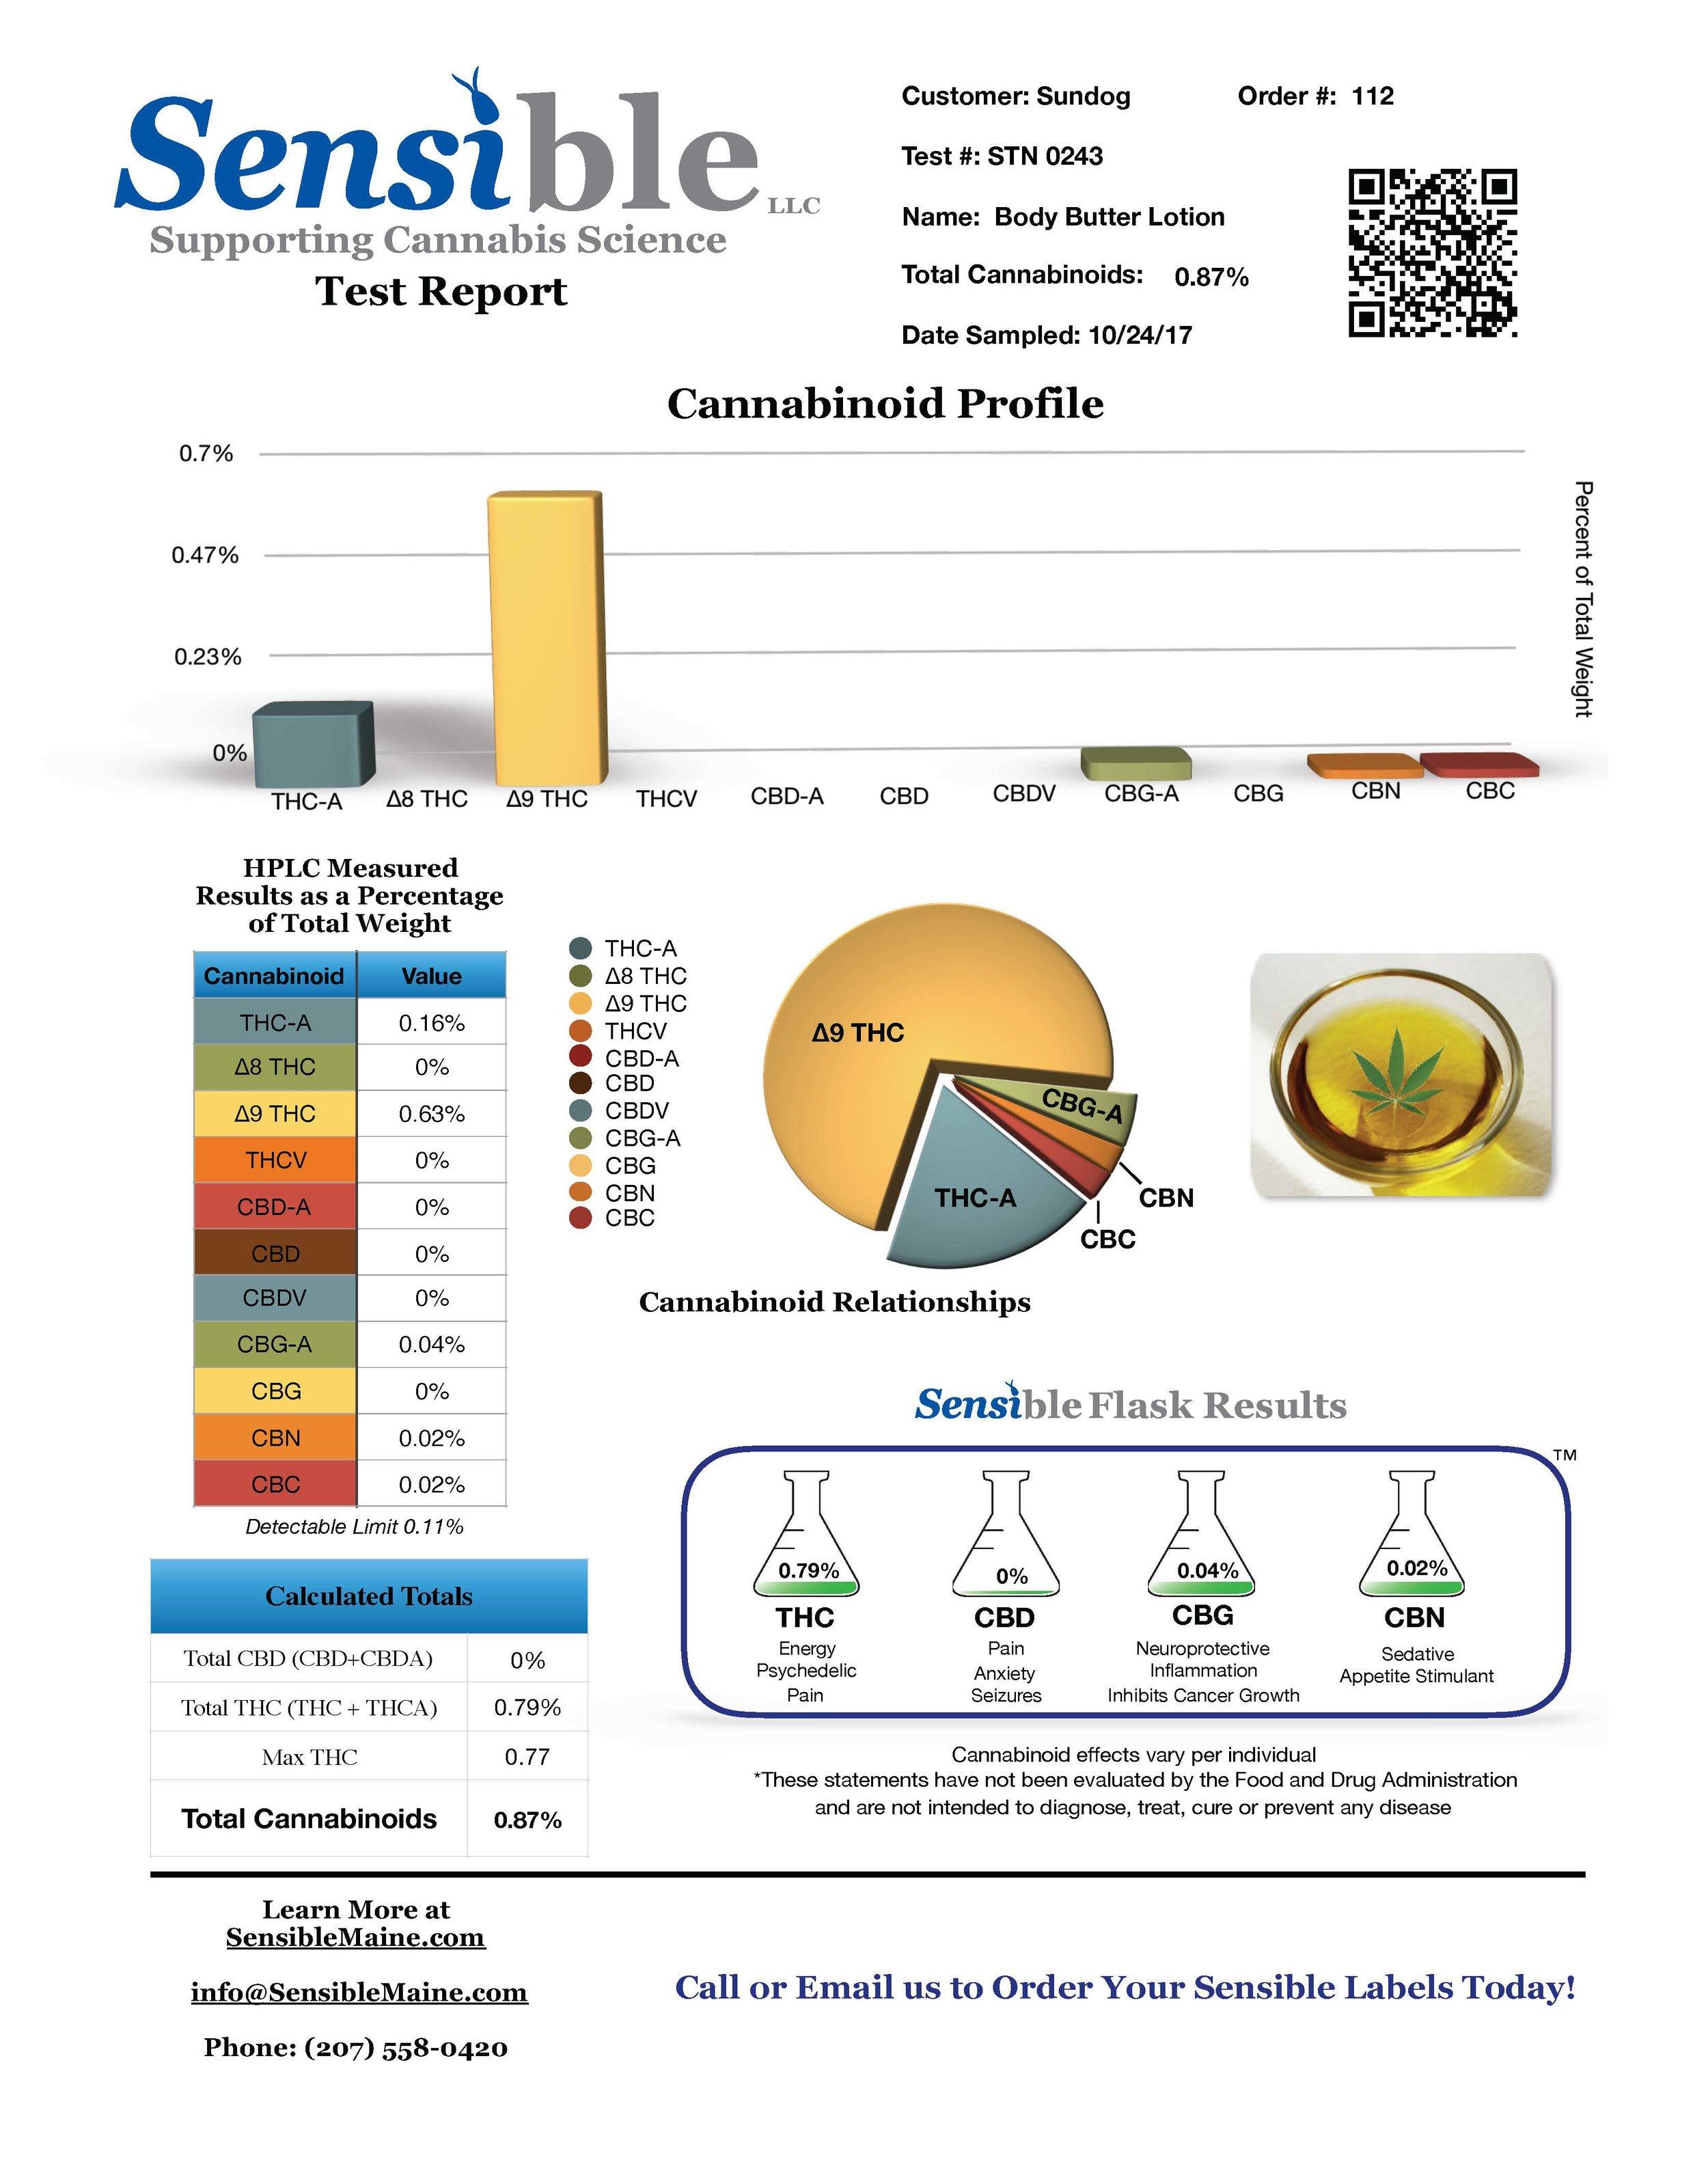 Test Report stn0243.jpg